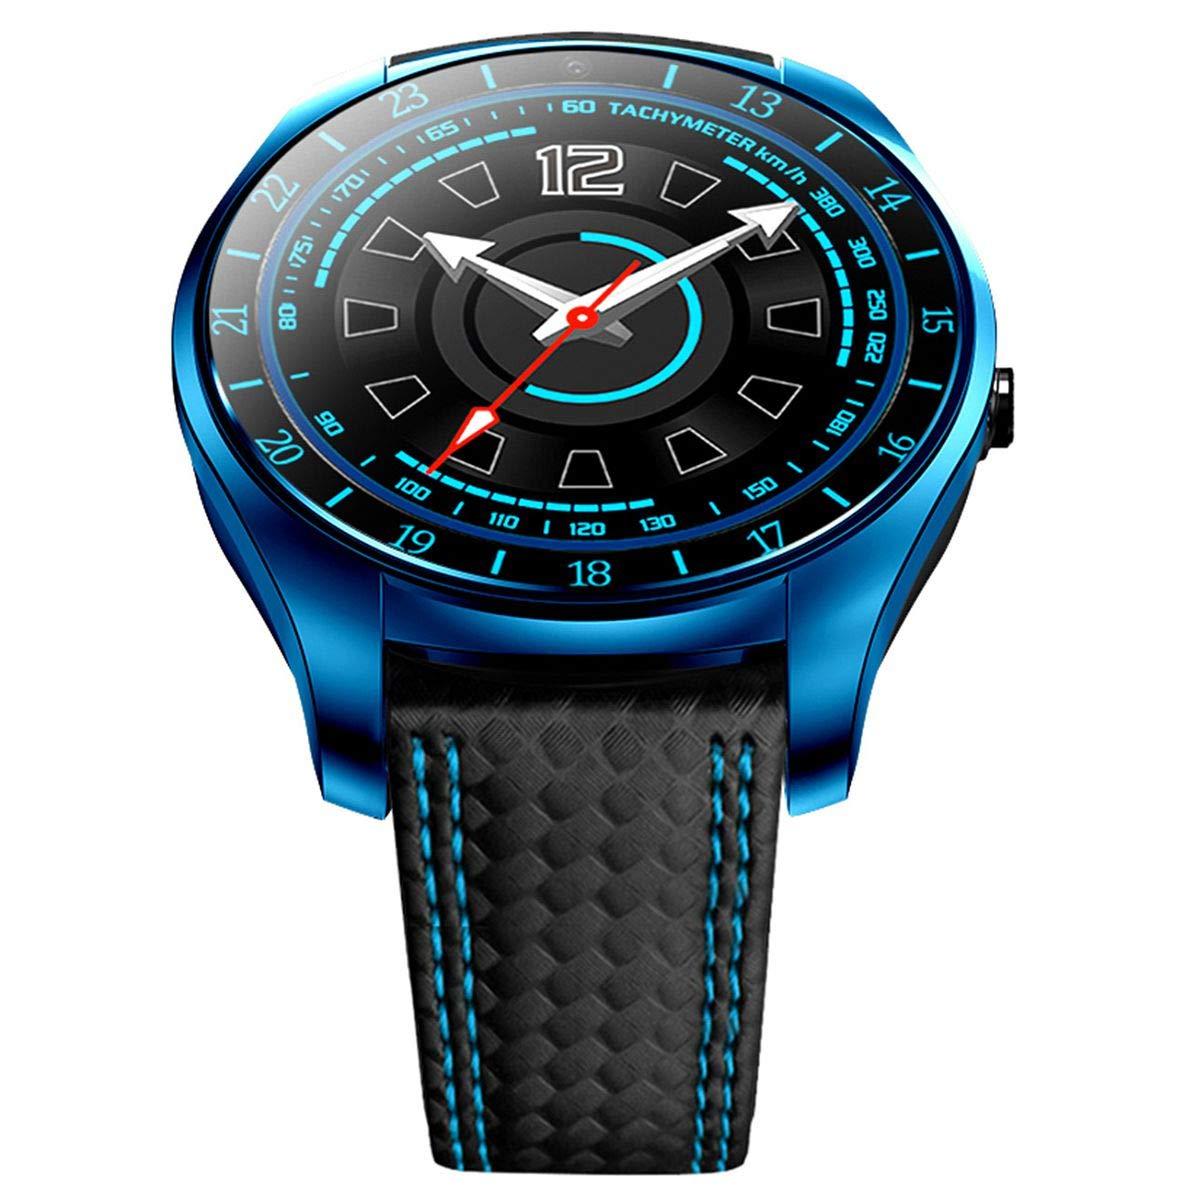 Amazon.com: SODIAL V10 Smart Watch Men with Camera Bluetooth ...